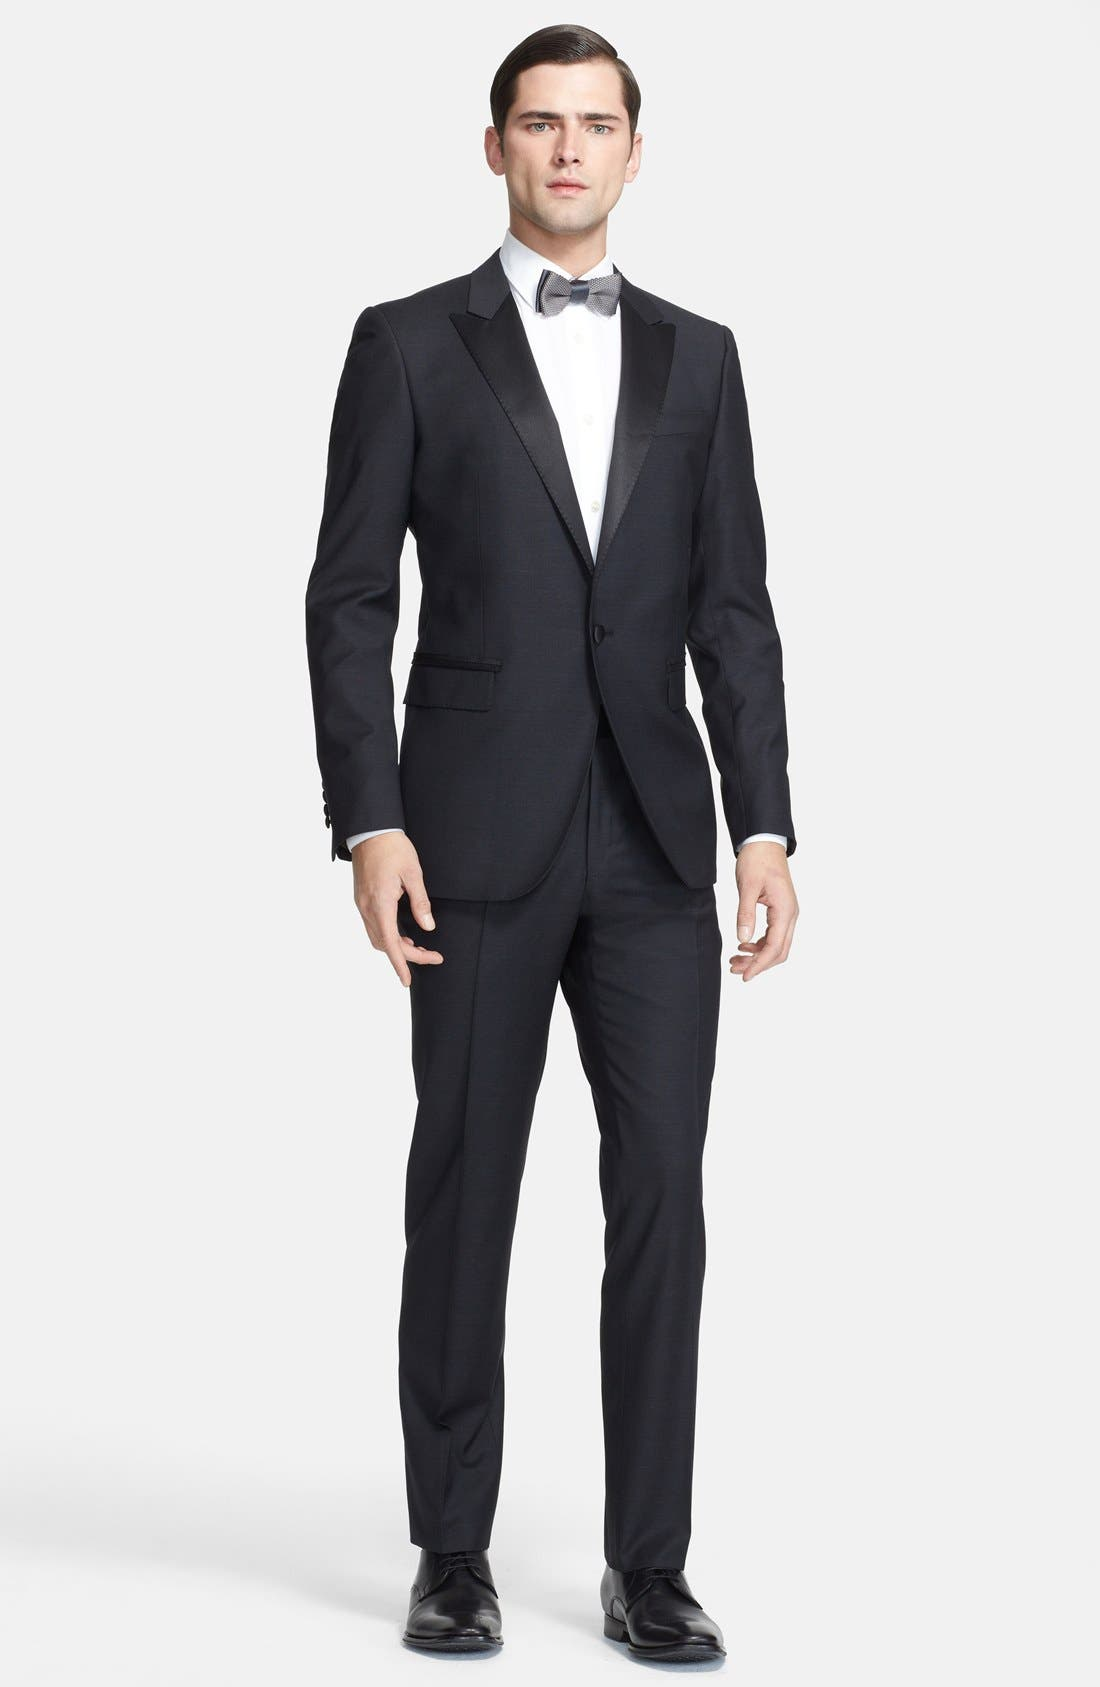 Alternate Image 1 Selected - Lanvin 'Attitude' Black Wool Tuxedo